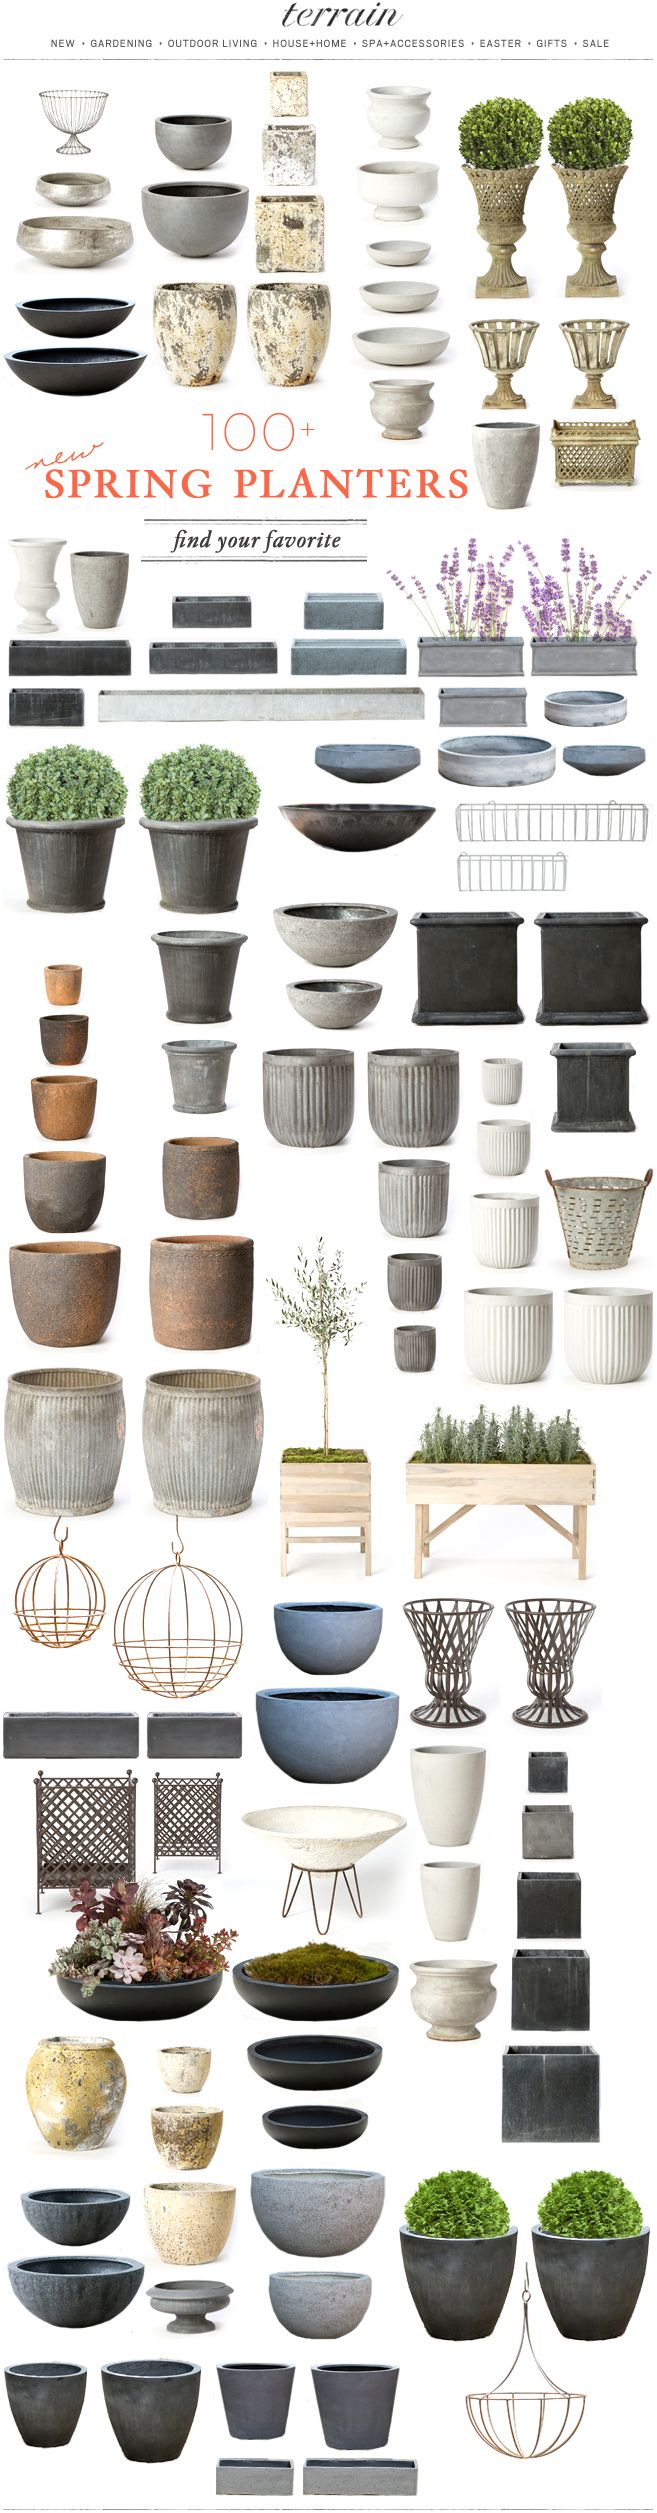 New Garden Ideas 2014 78 best Ω pots planters Ω images on pinterest | gardens, garden